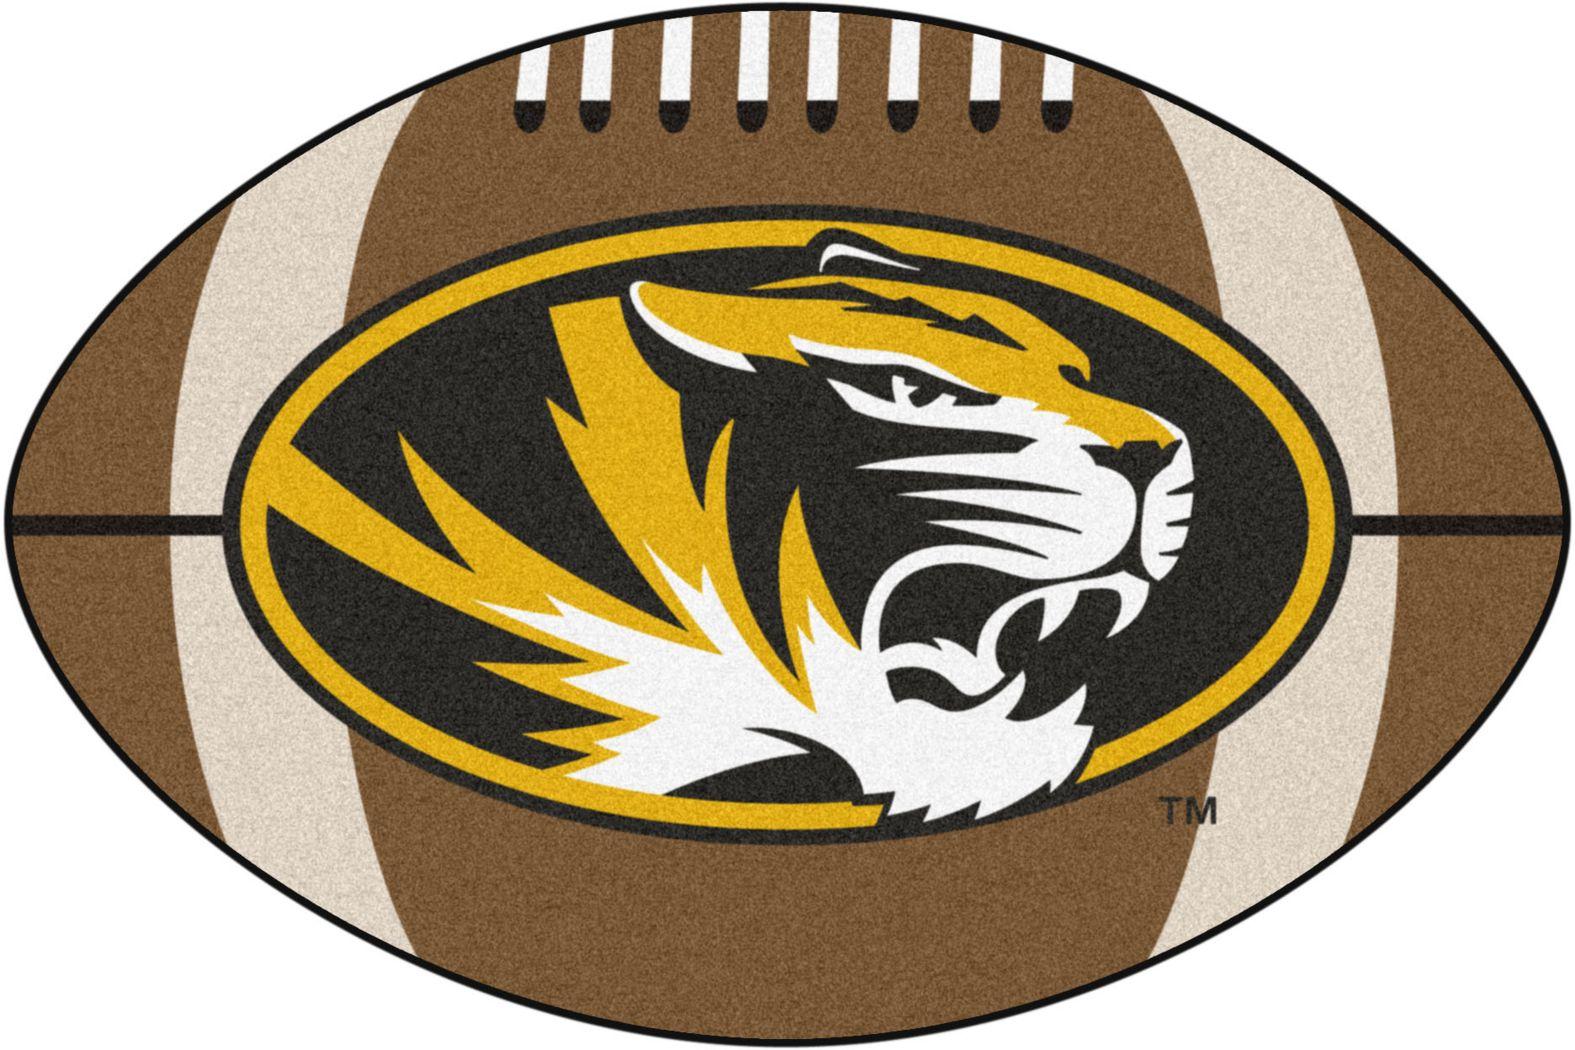 "NCAA Football Mascot University of Missouri 1'6"" x 1'10"" Rug"